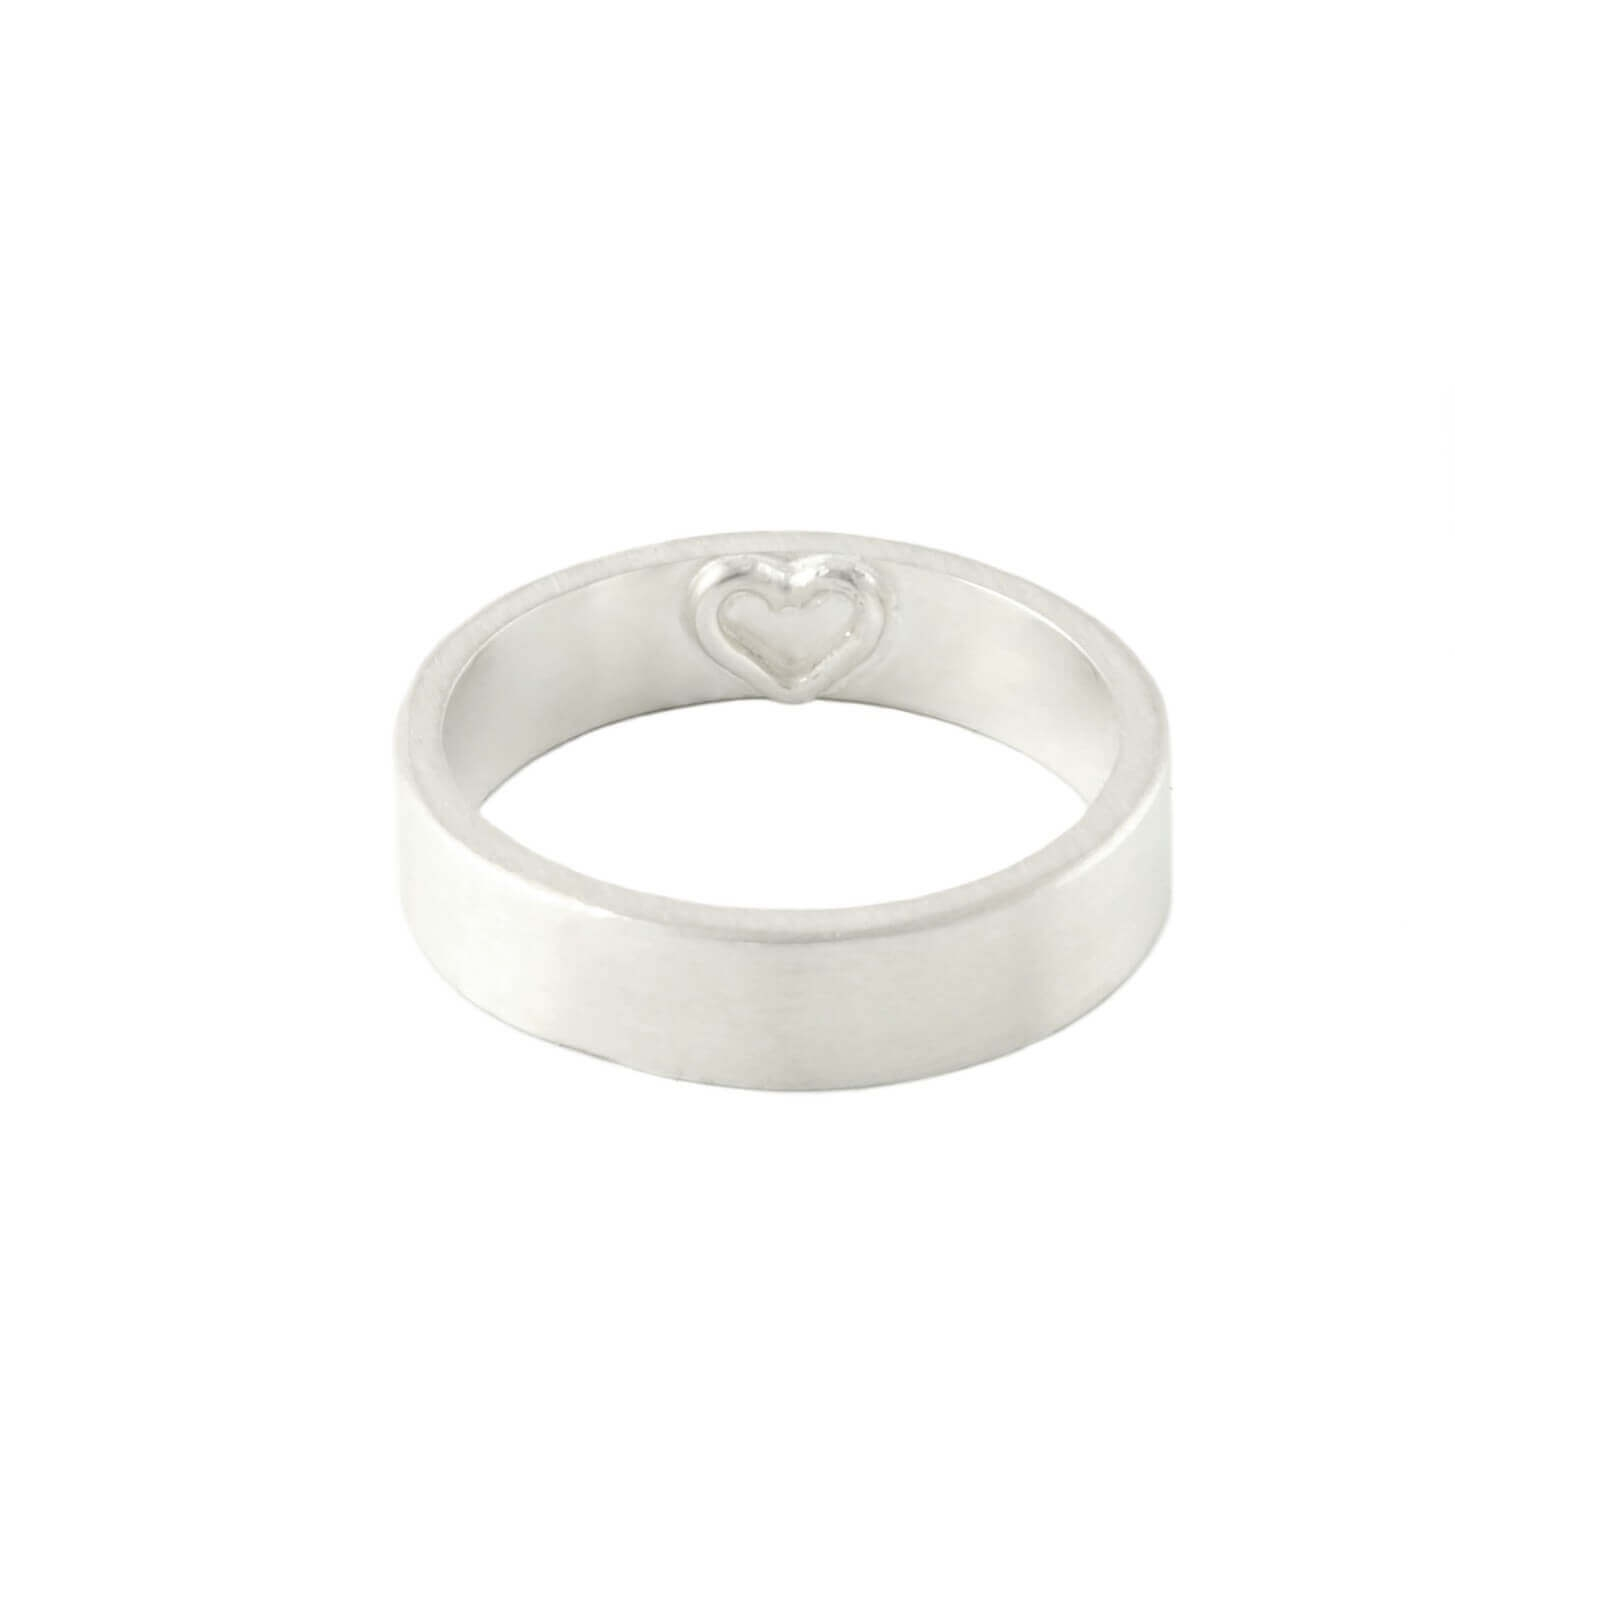 Imprint Heart Ring